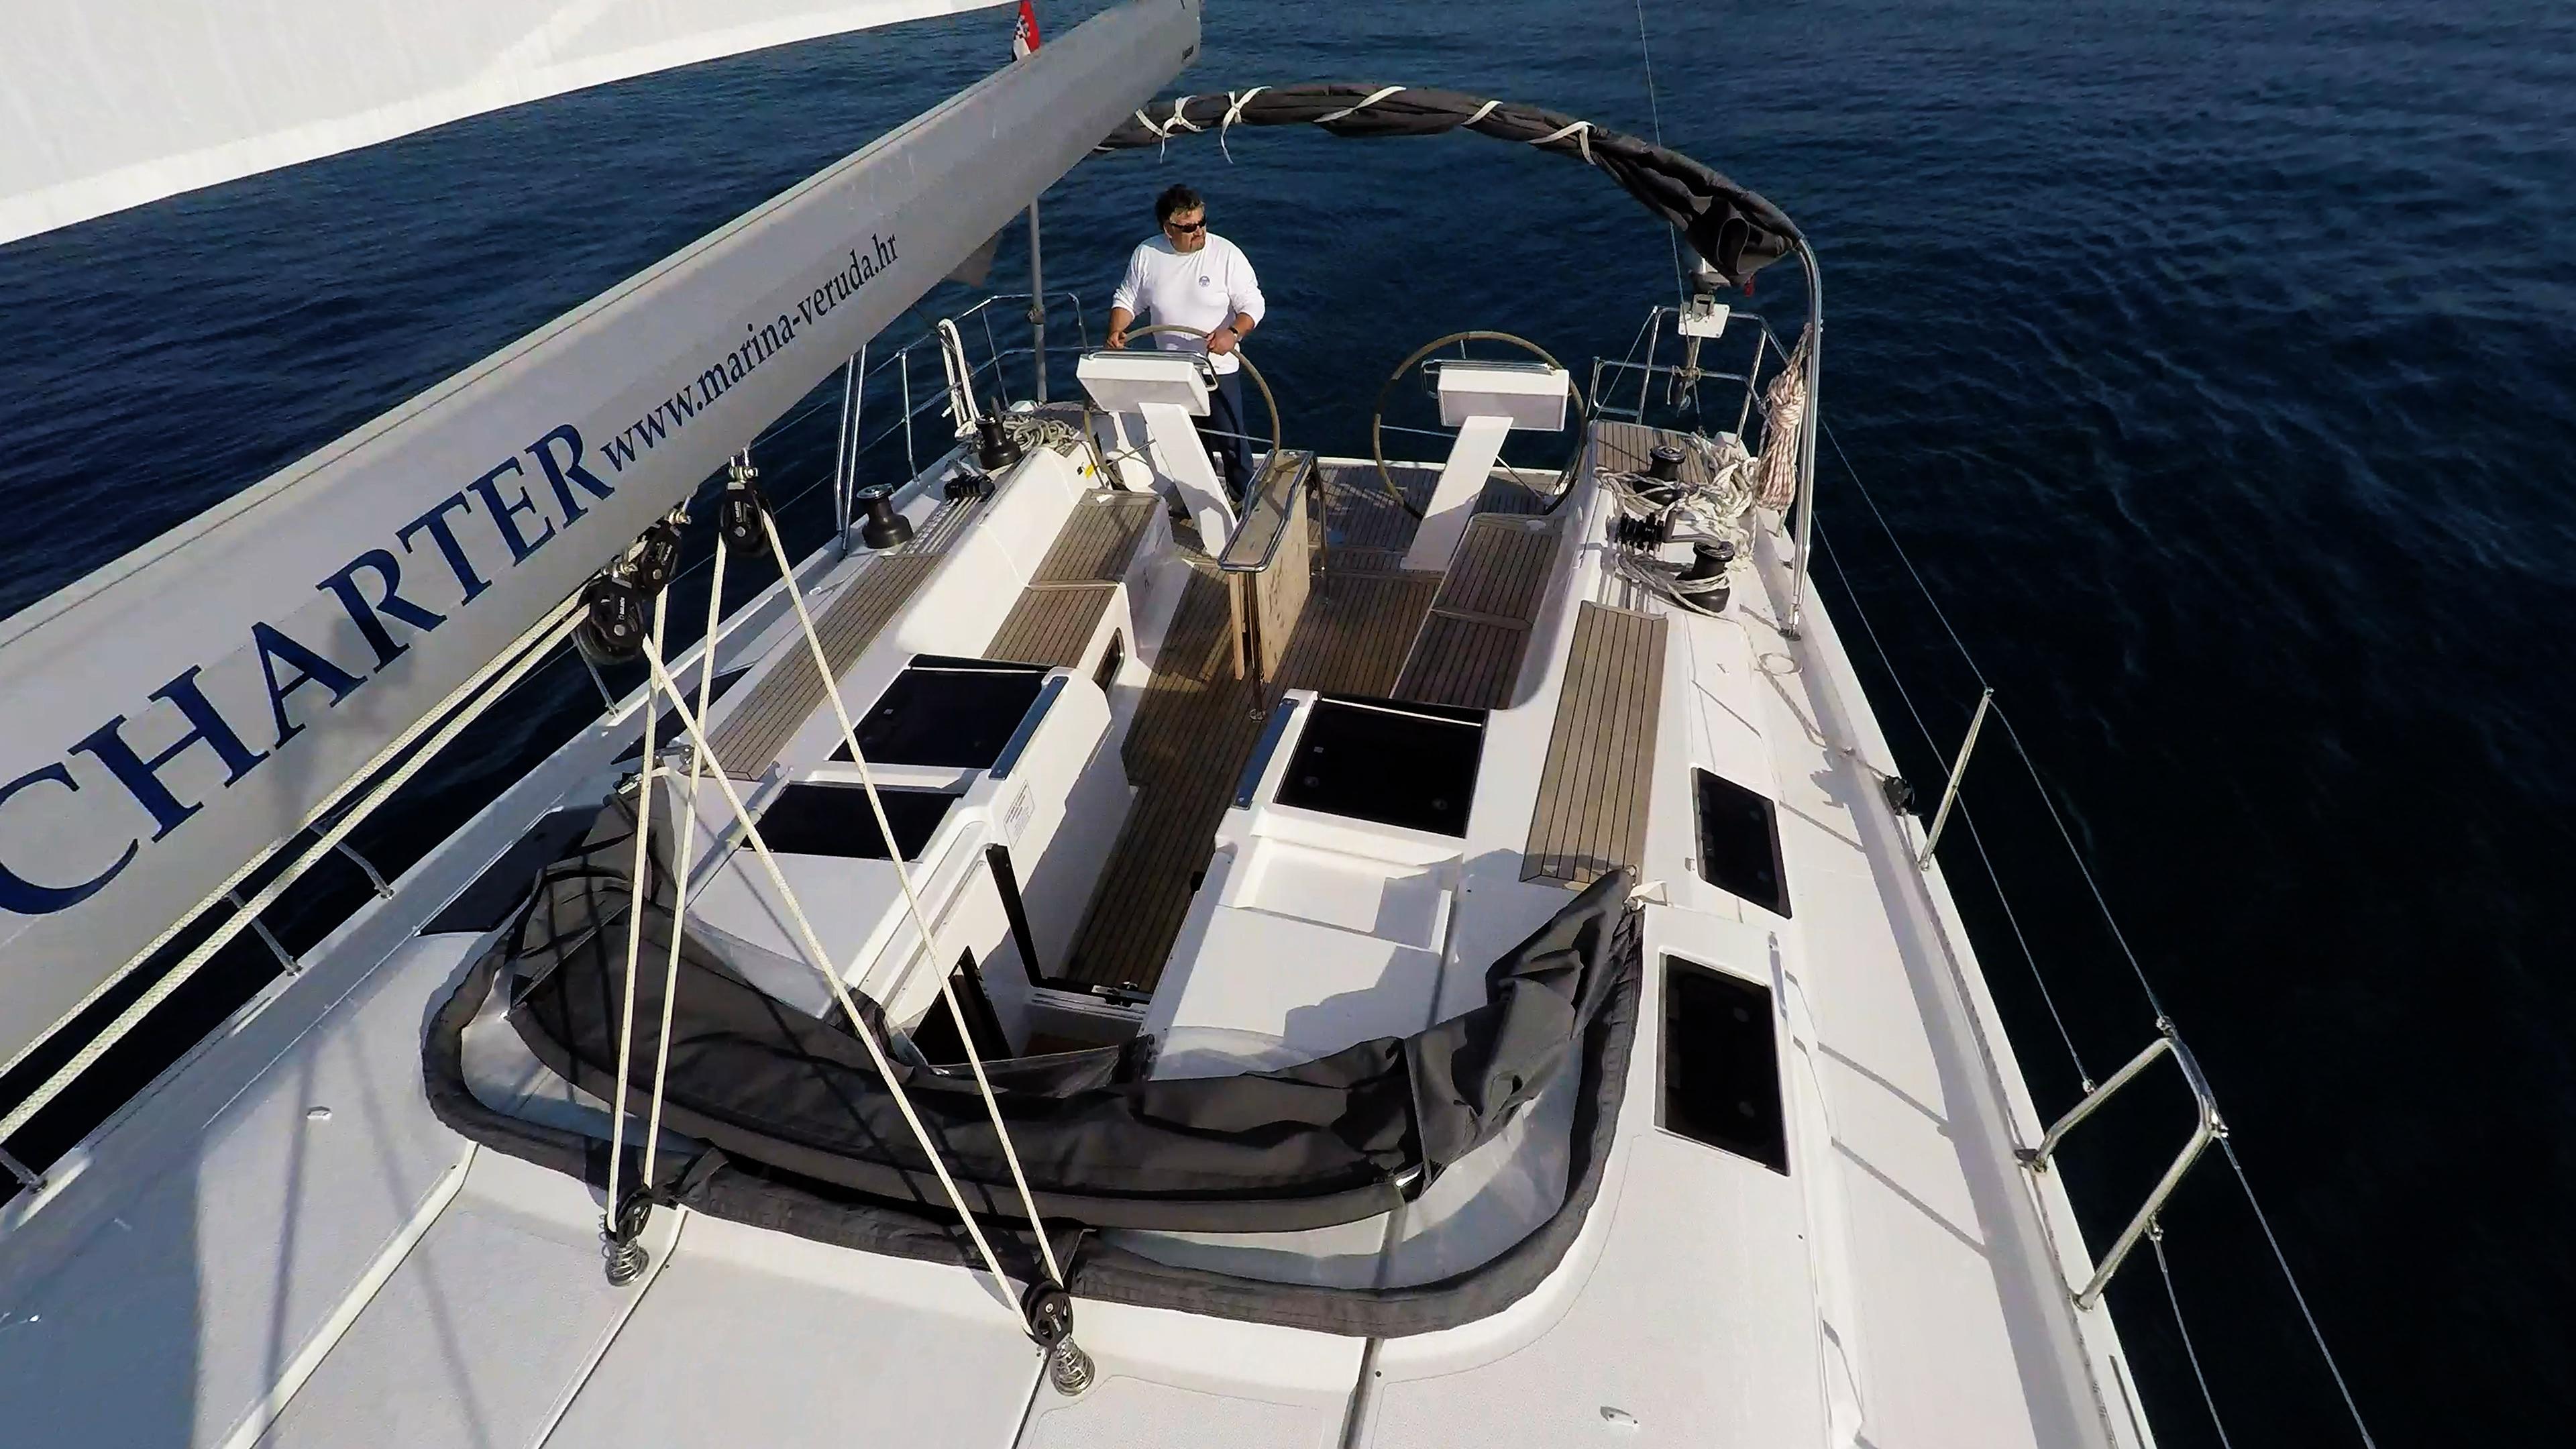 barcha a vela copertain teak per barche a vela doppio timone ruota pozzetto skipper veleggiare veleggiare al mare